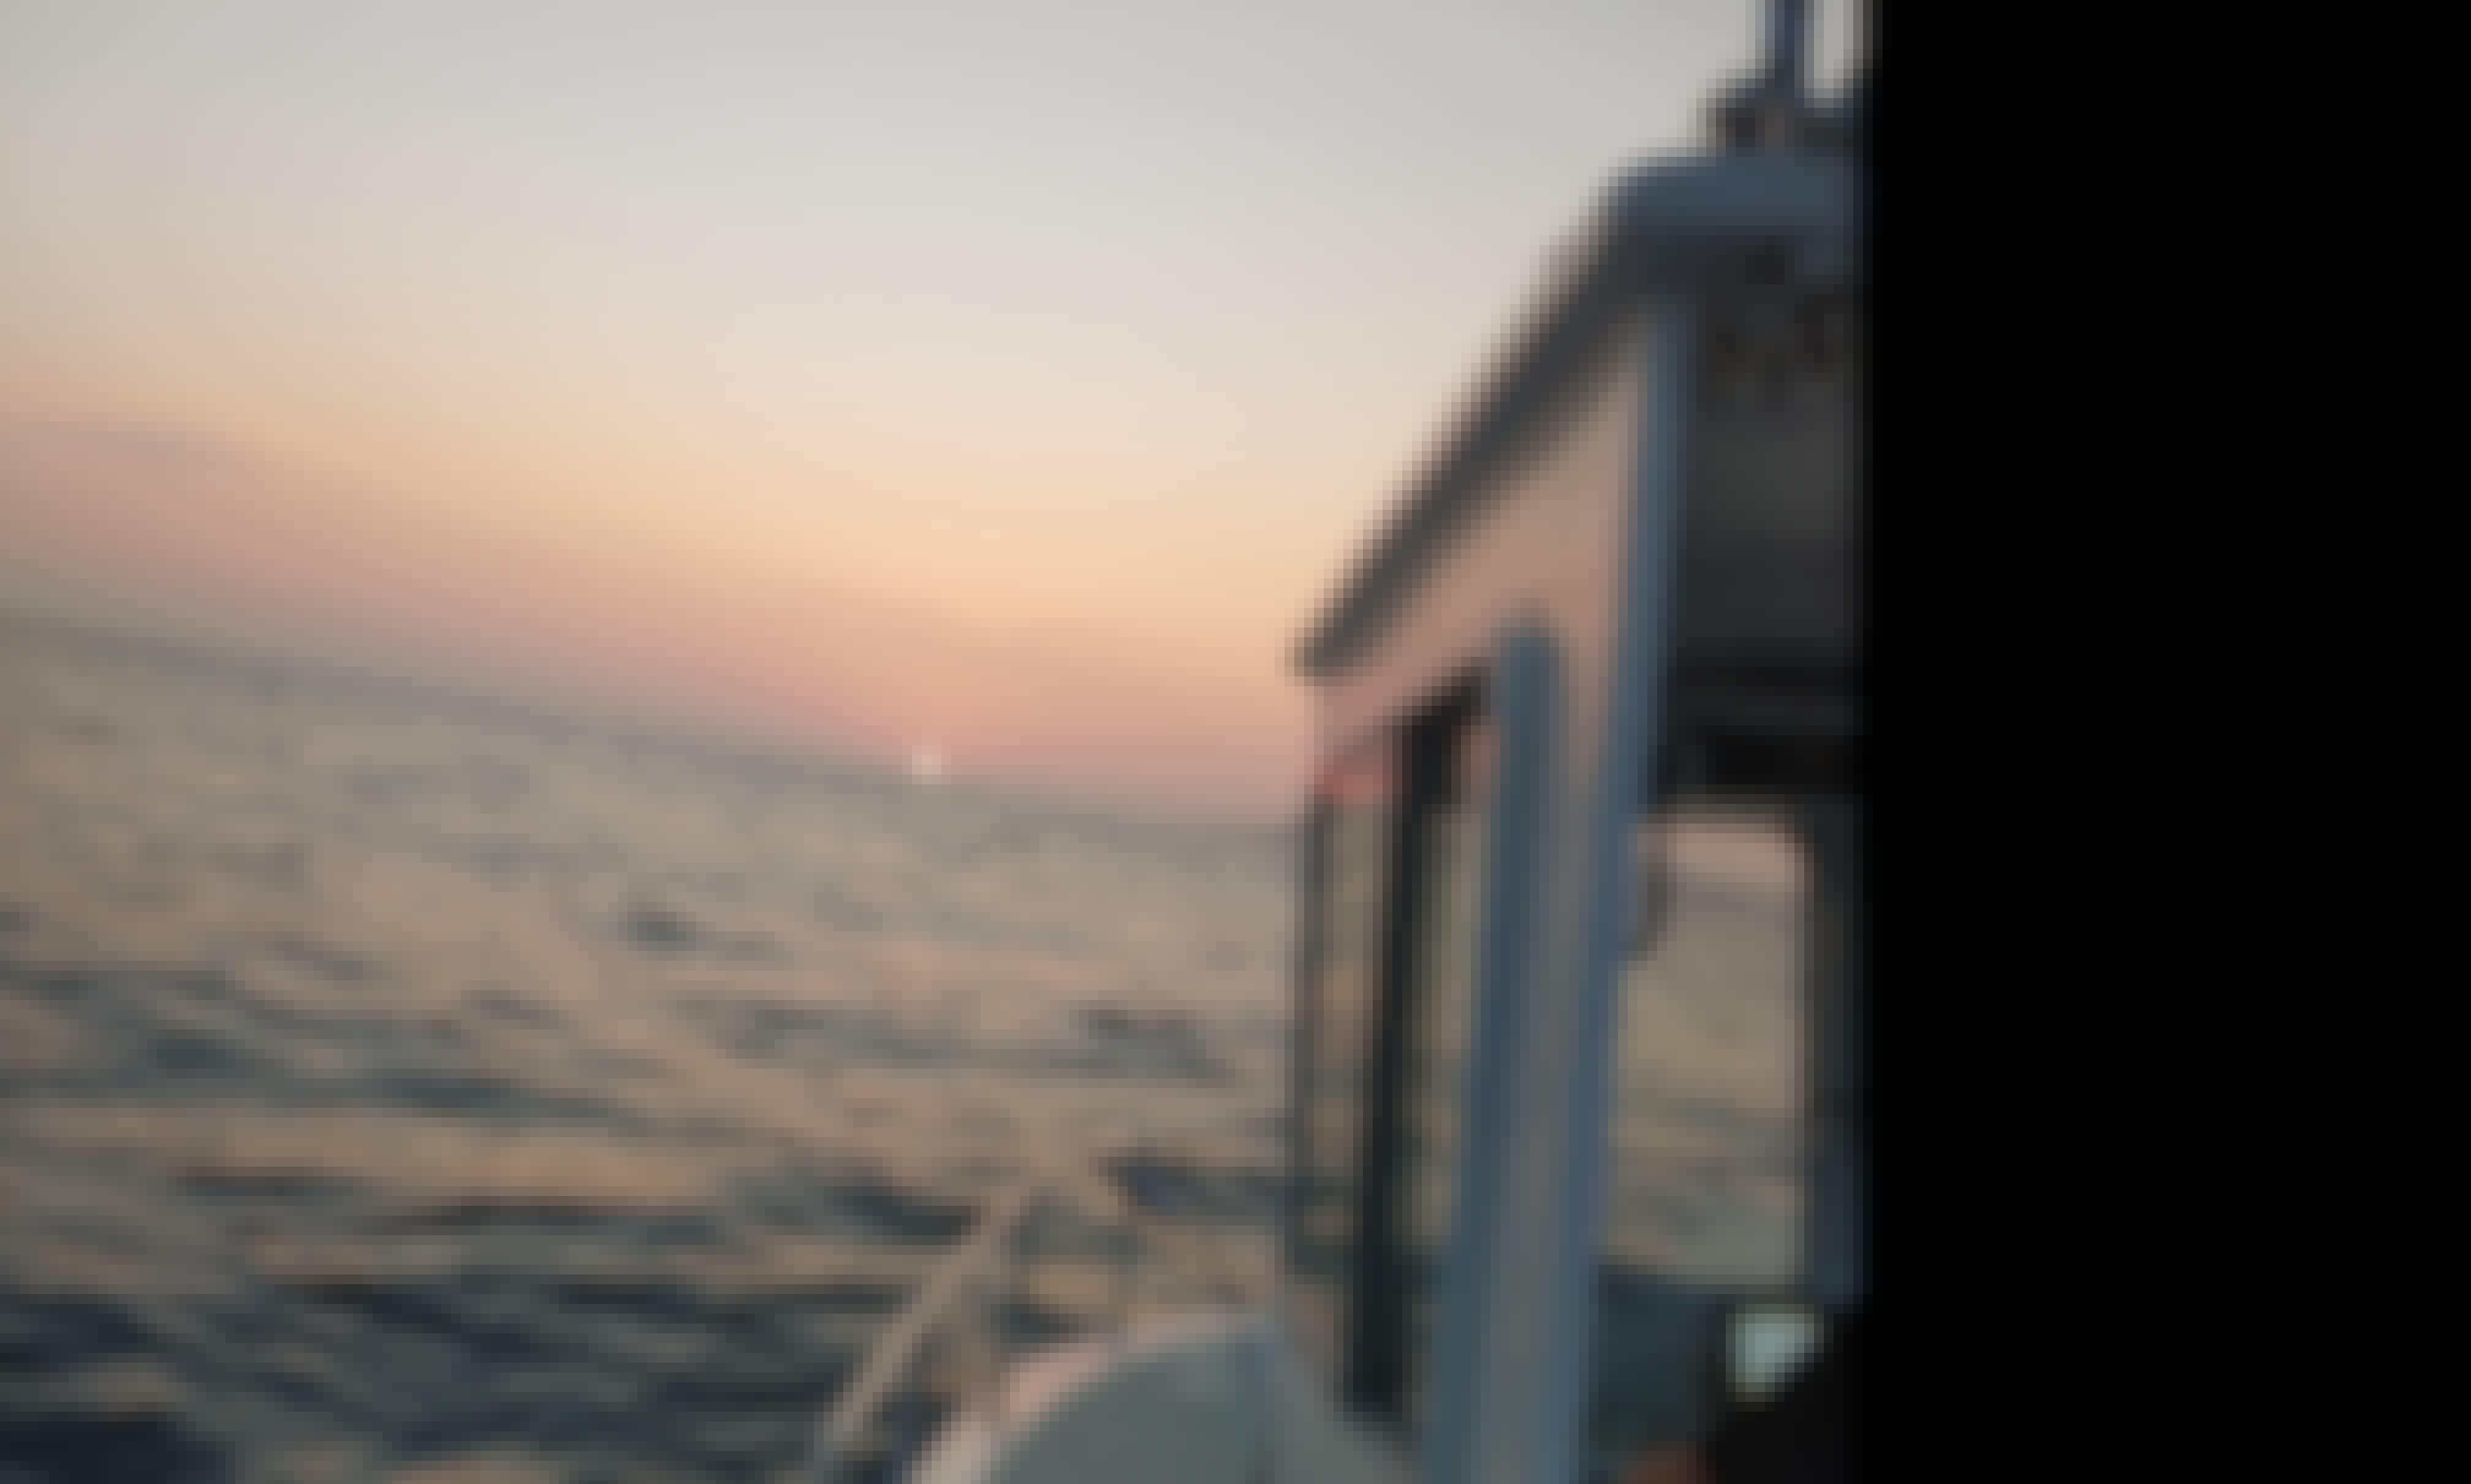 Fishing Boat for Rent in coronado, California